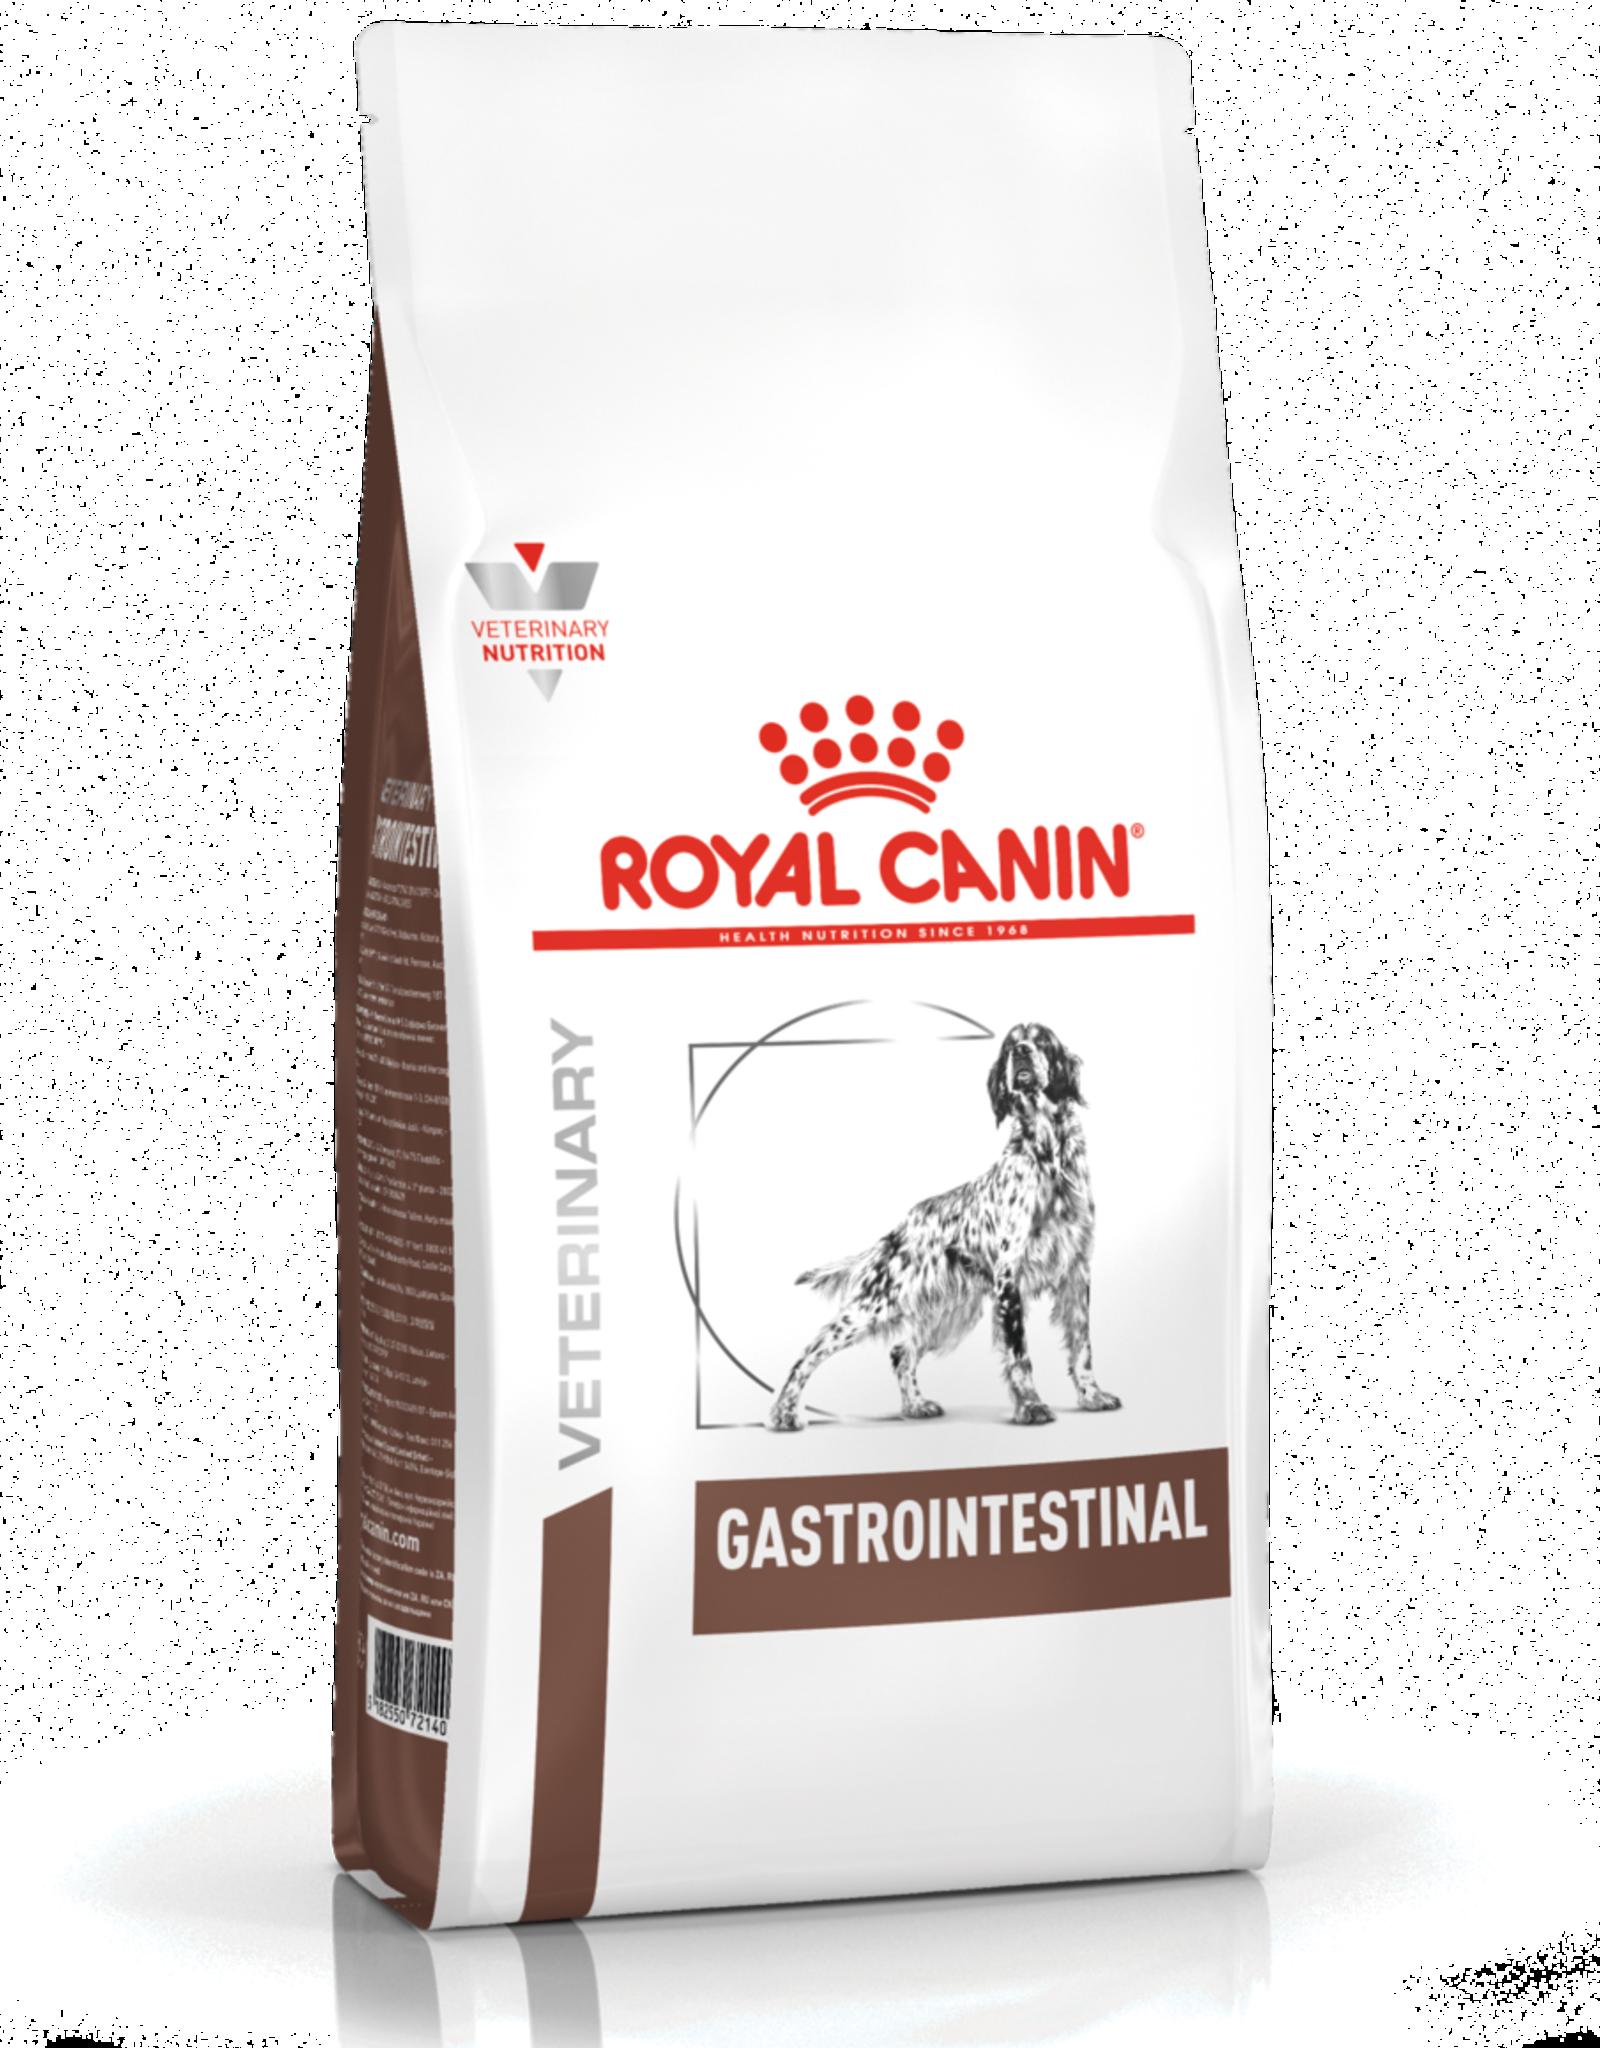 Royal Canin Royal Canin Gastro Intestinal Chien 15kg